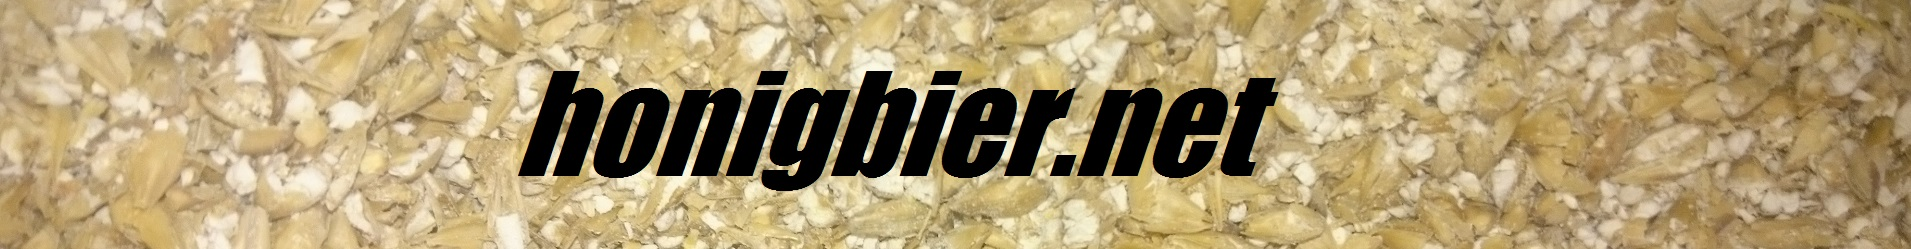 honigbier.net